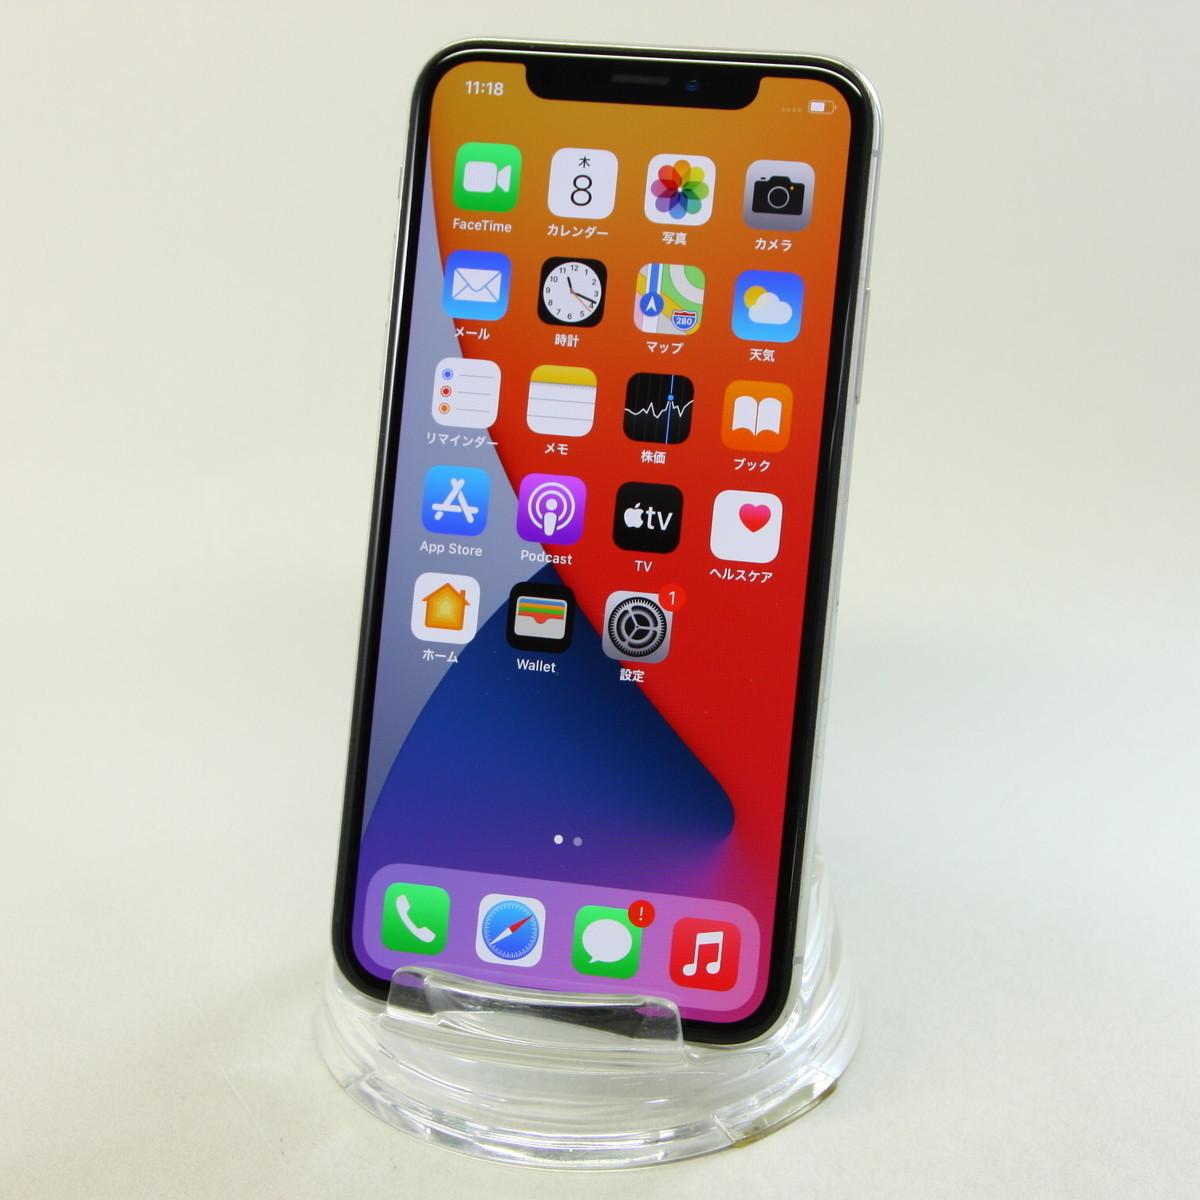 Apple iPhoneX 64GB シルバー A1902 MQAY2J/A バッテリ93%■SIMフリー(SIMロック解除済)★Joshin3356【送料無料・1円】